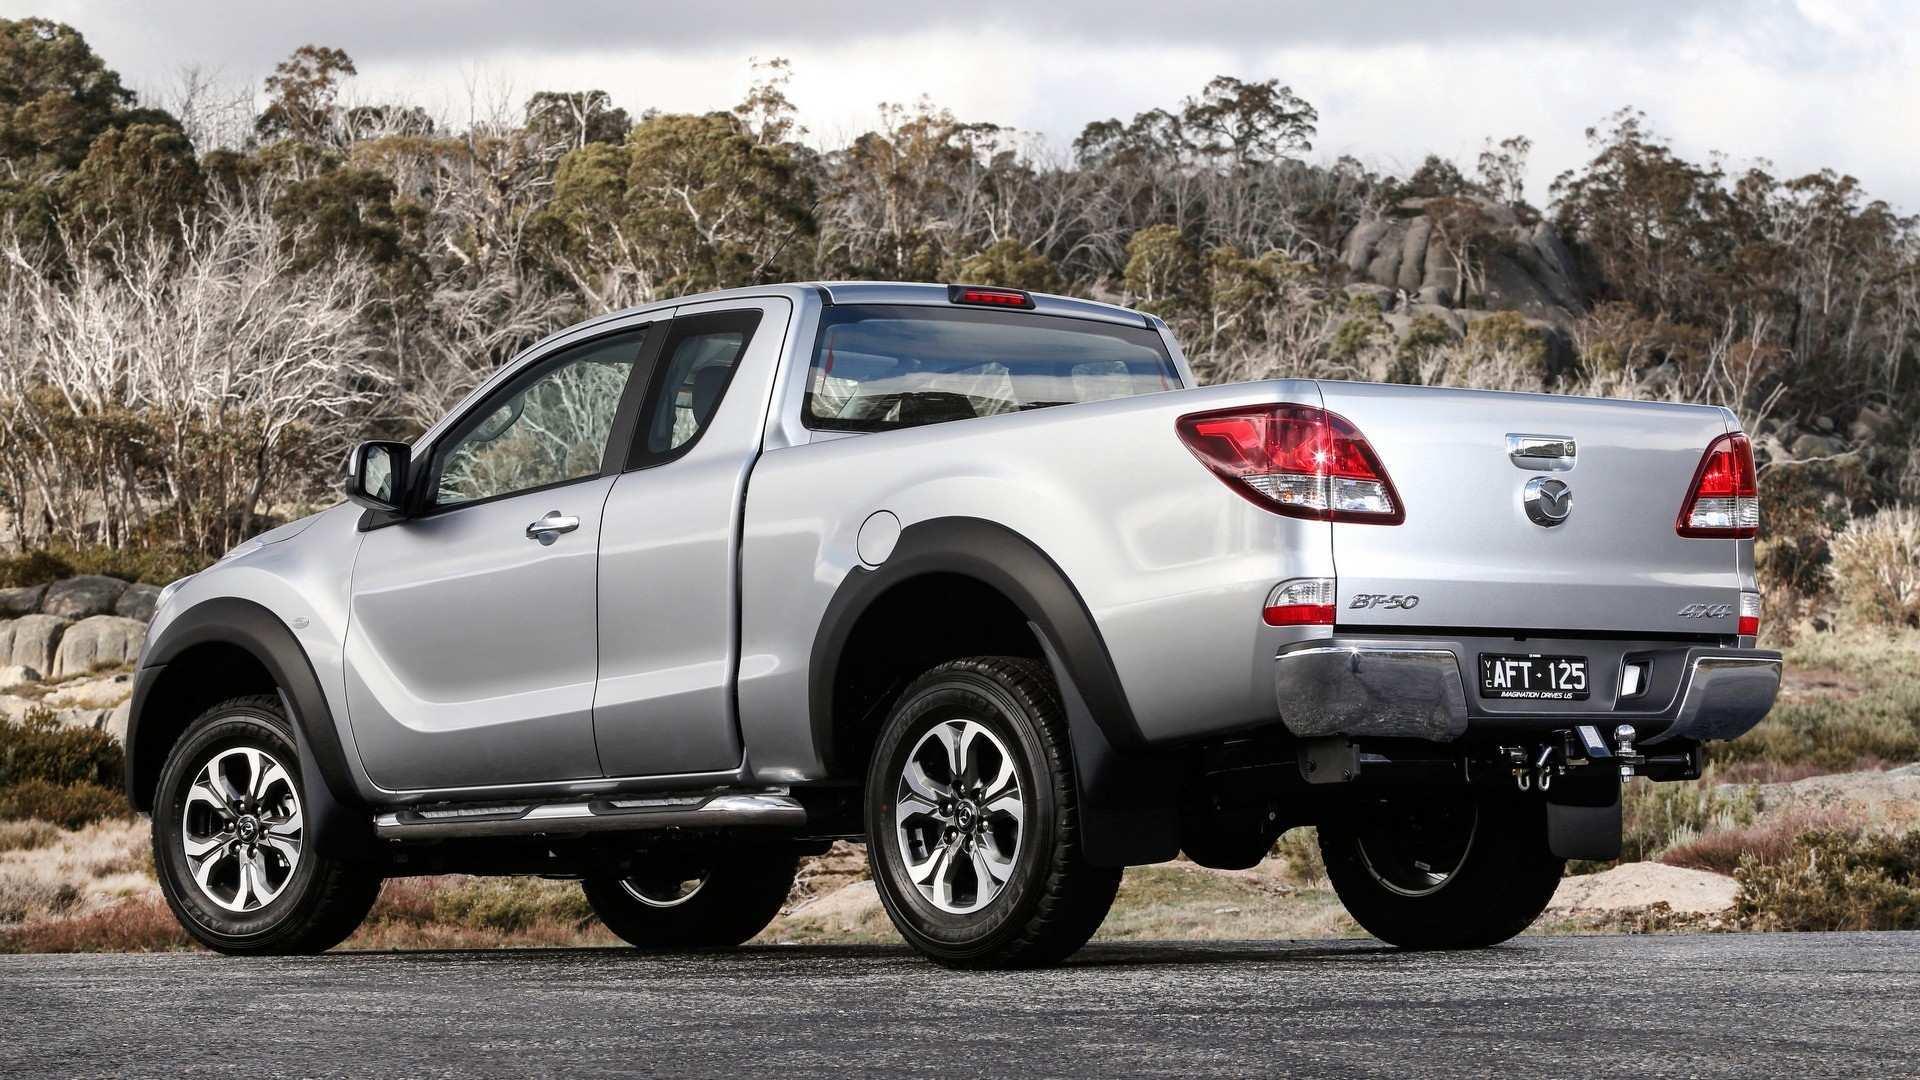 53 New 2020 Mazda Truck Release Date by 2020 Mazda Truck